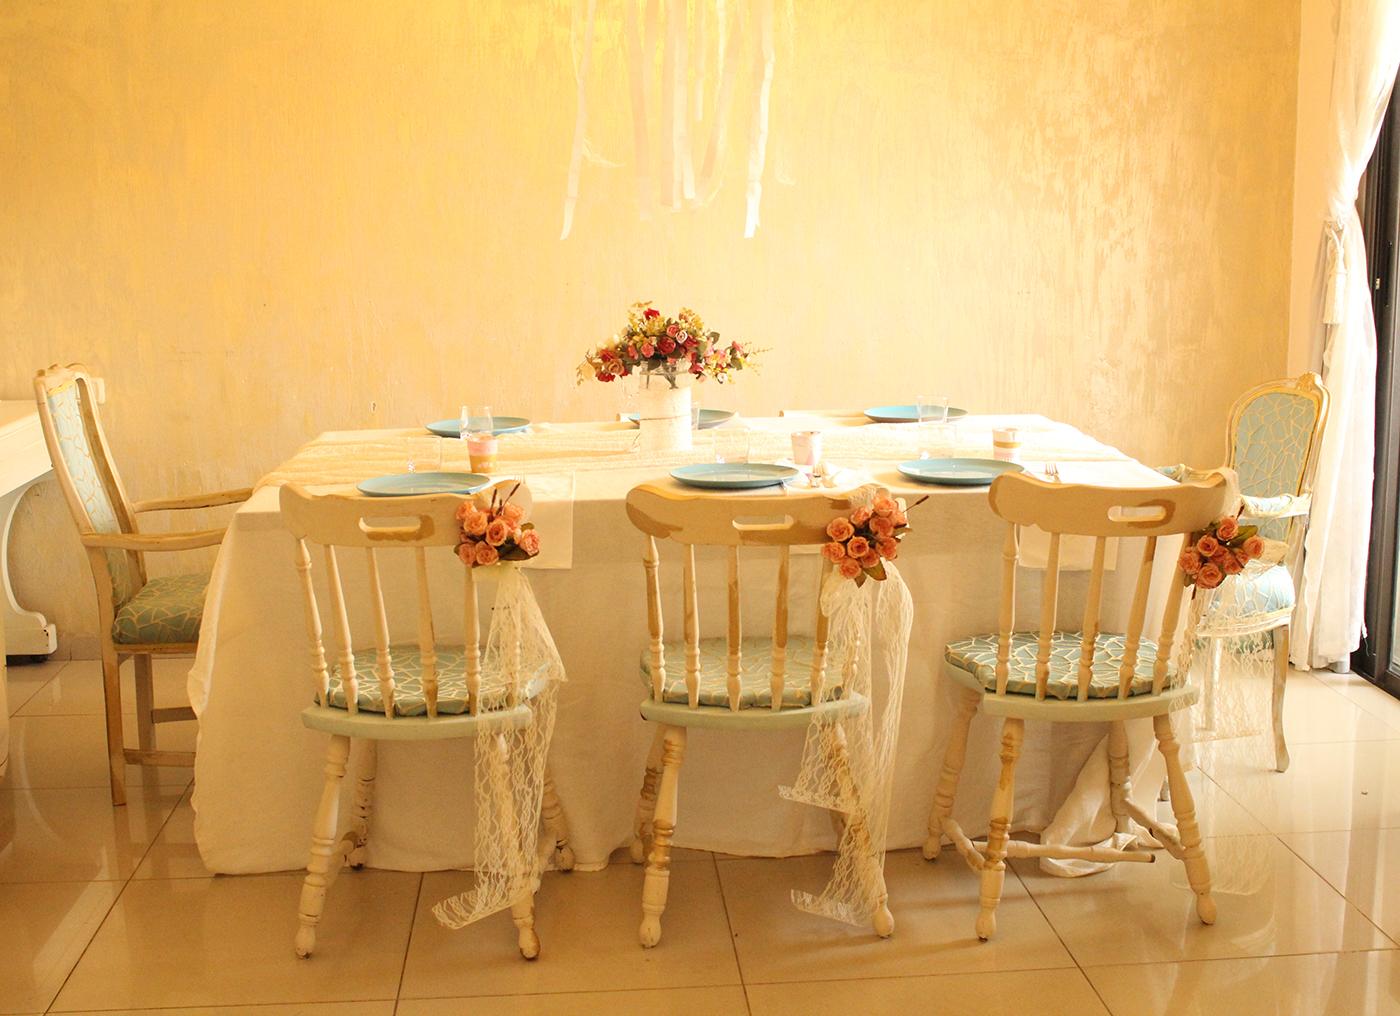 IMG 8113 - חידוש כסאות לפינת אוכל בסלון